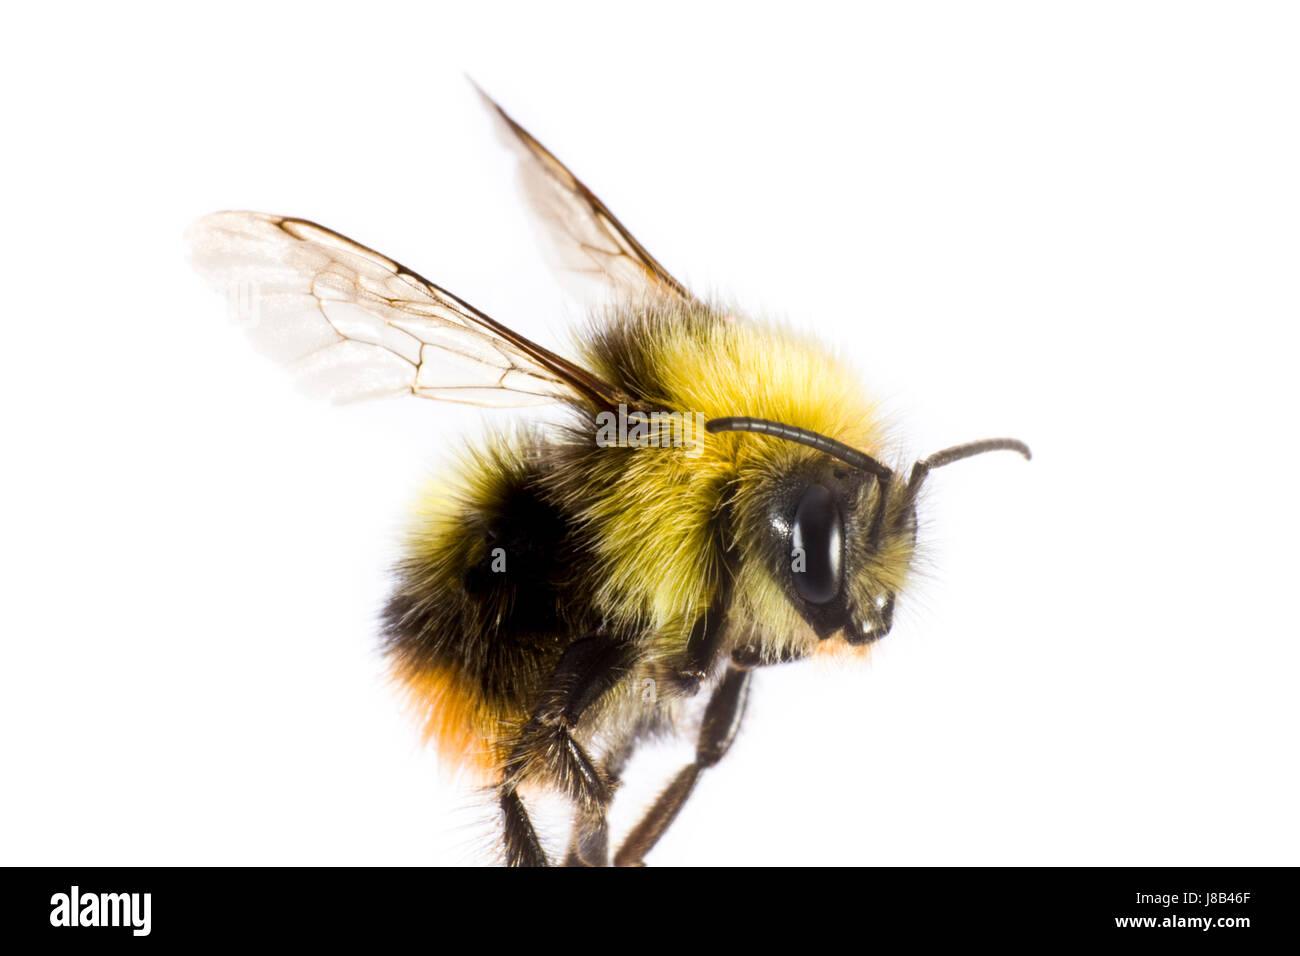 bee sting skin stock photos u0026 bee sting skin stock images alamy